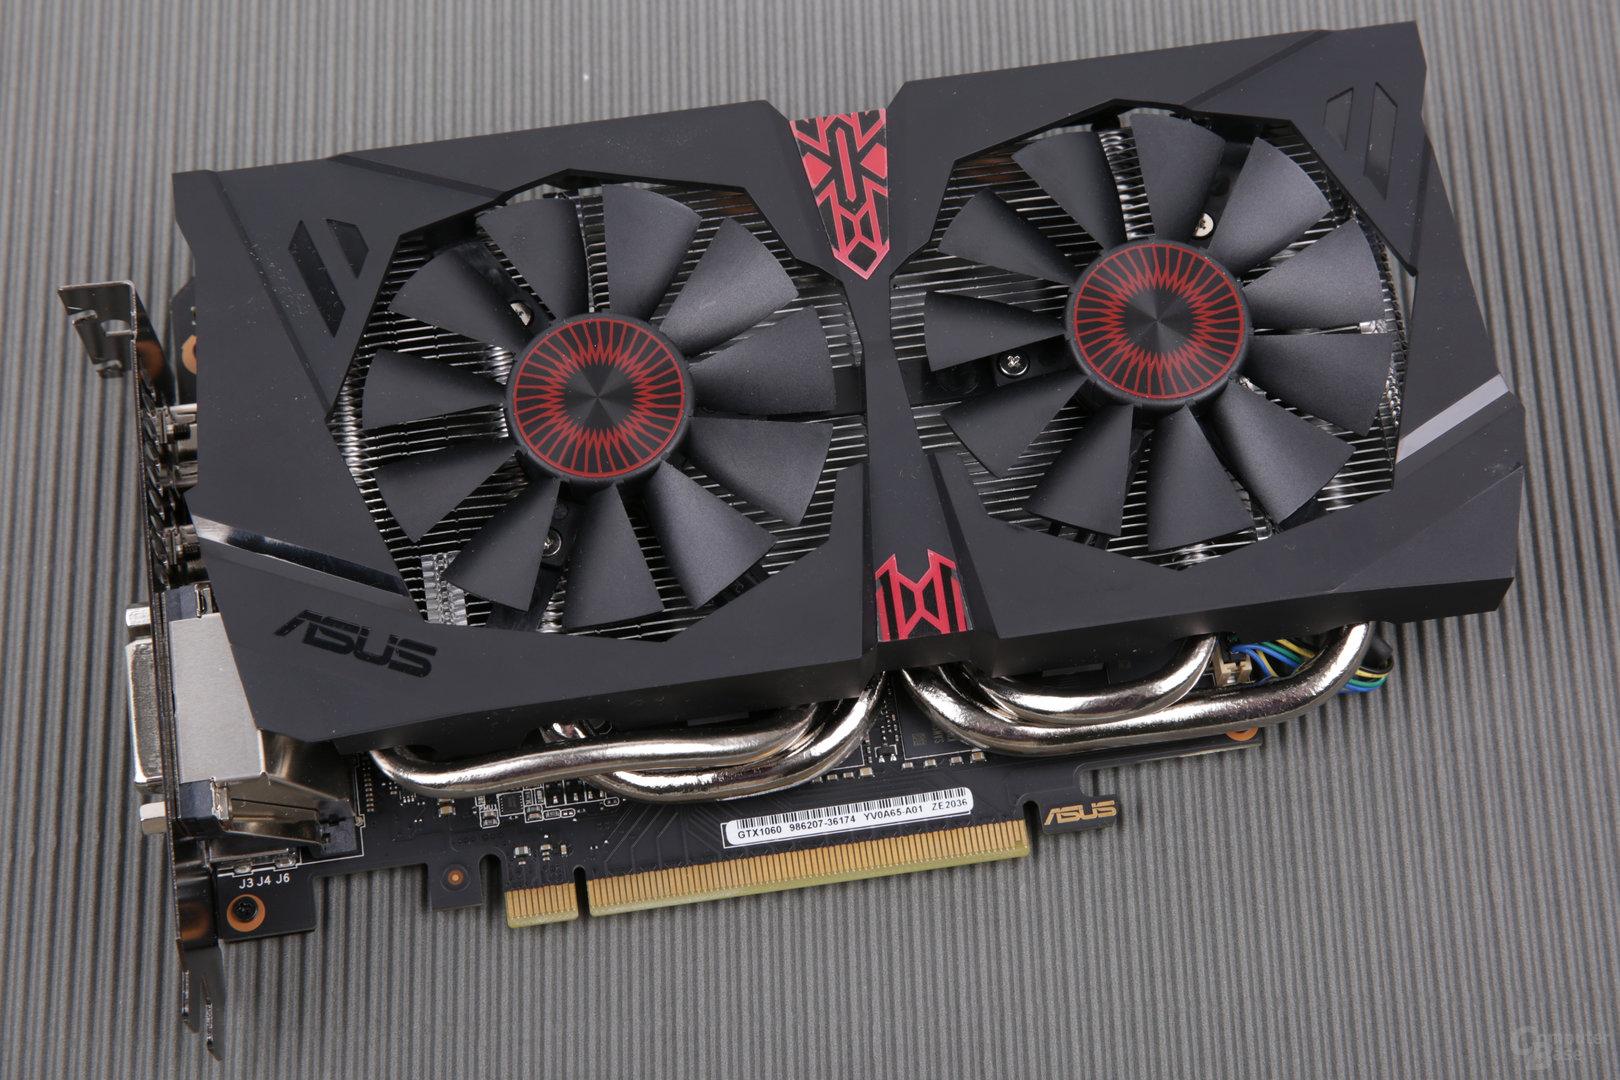 Asus GeForce GTX 1060 9 Gbps